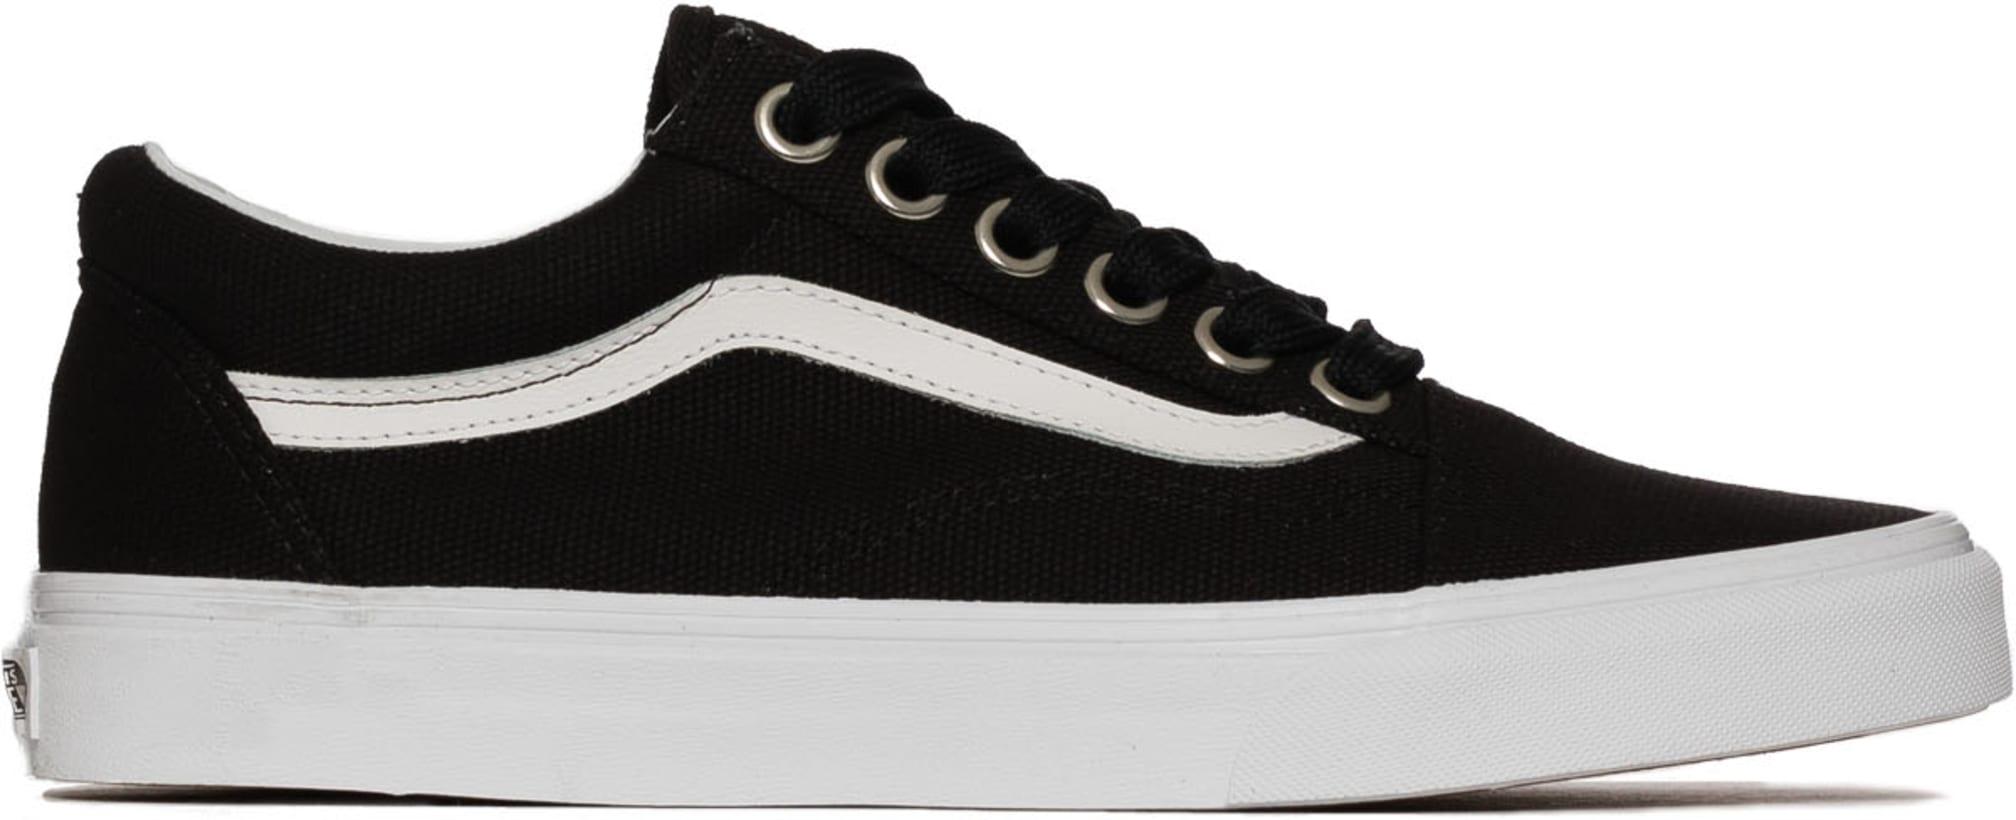 67e5255987ac Vans  Old Skool Oversize Lace - Black True White